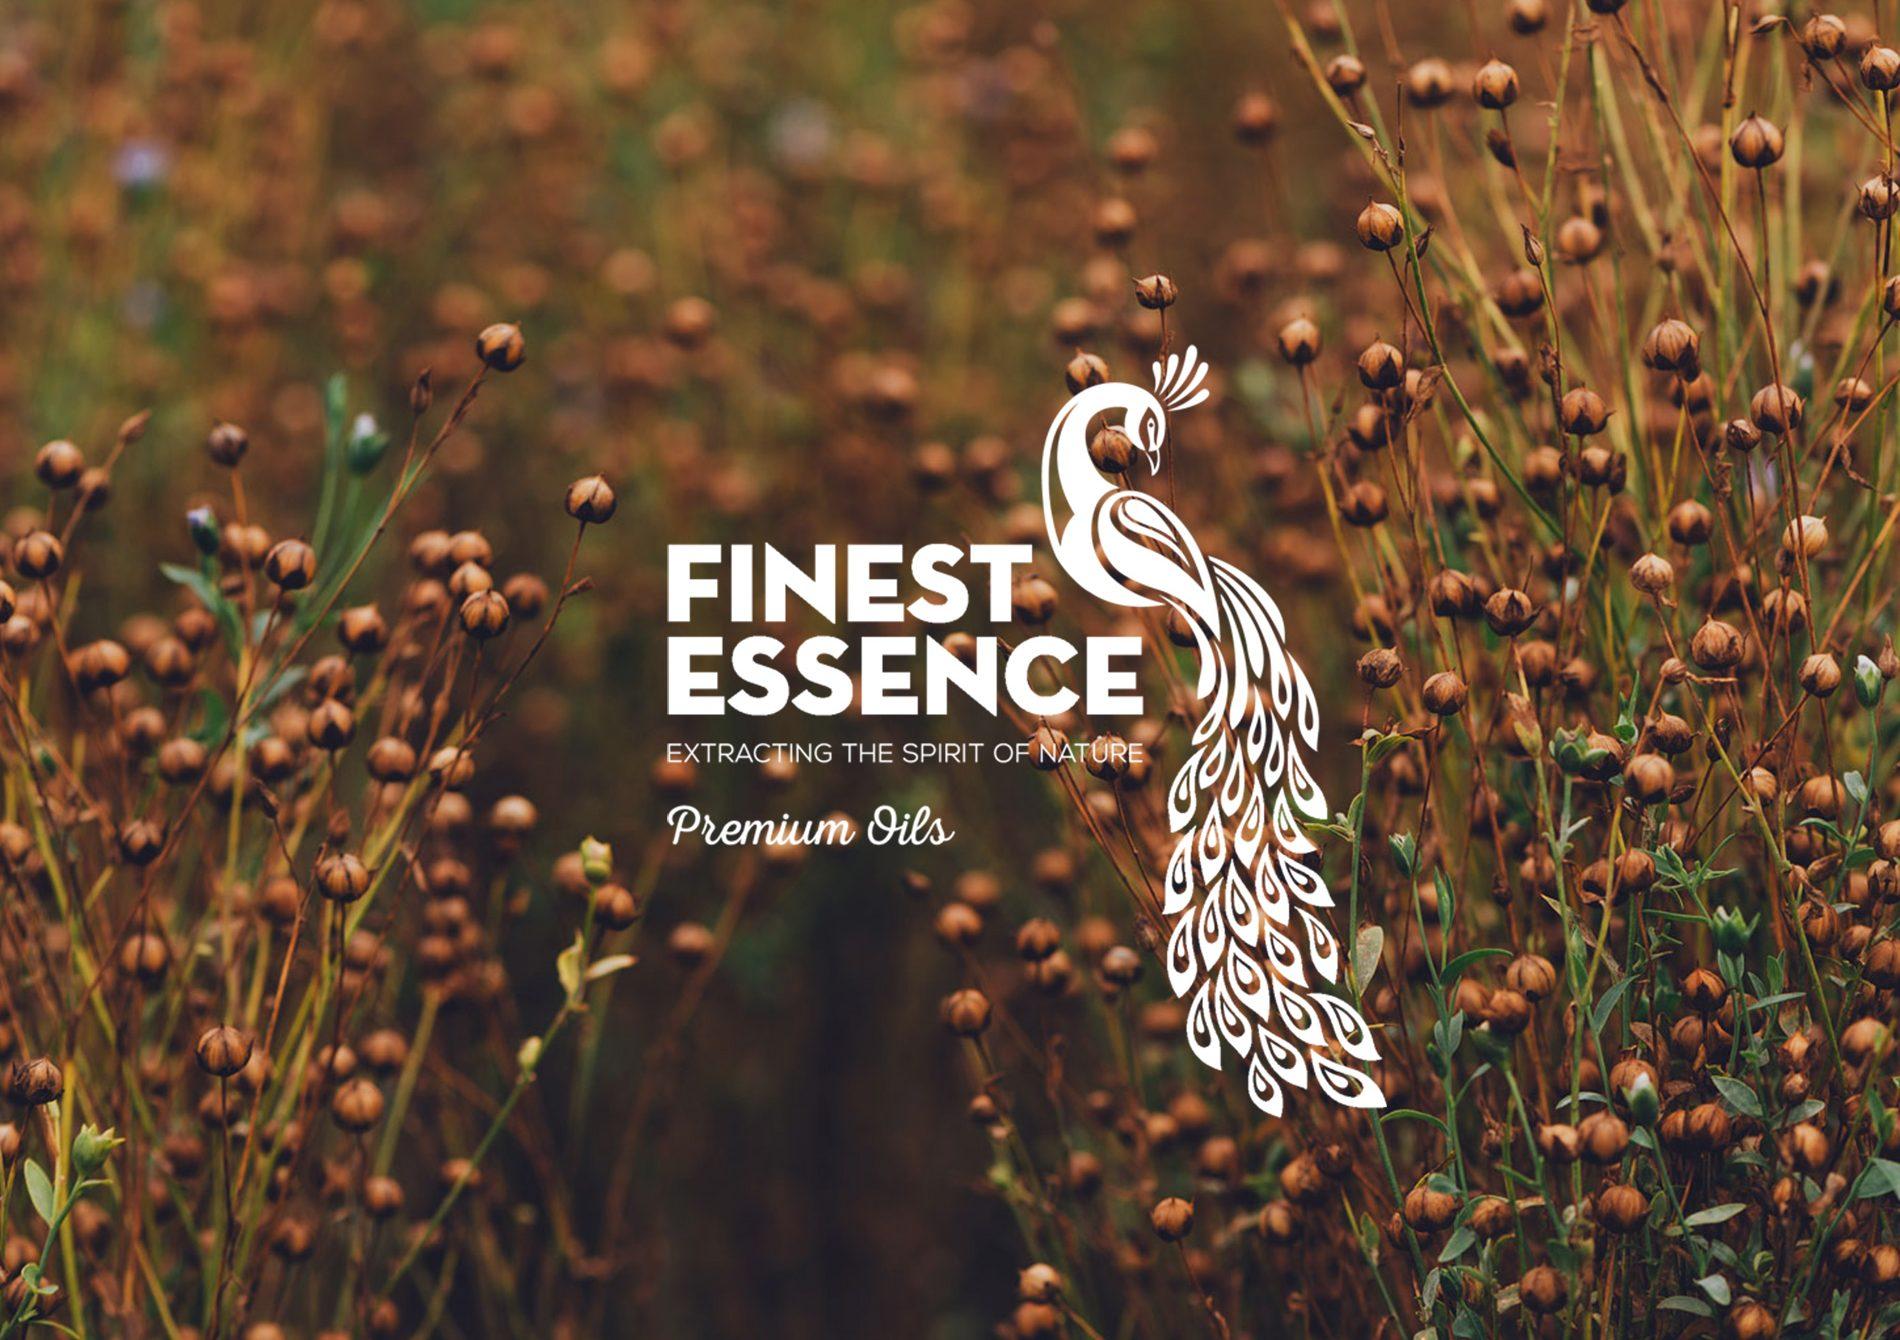 Finest-Essence-1